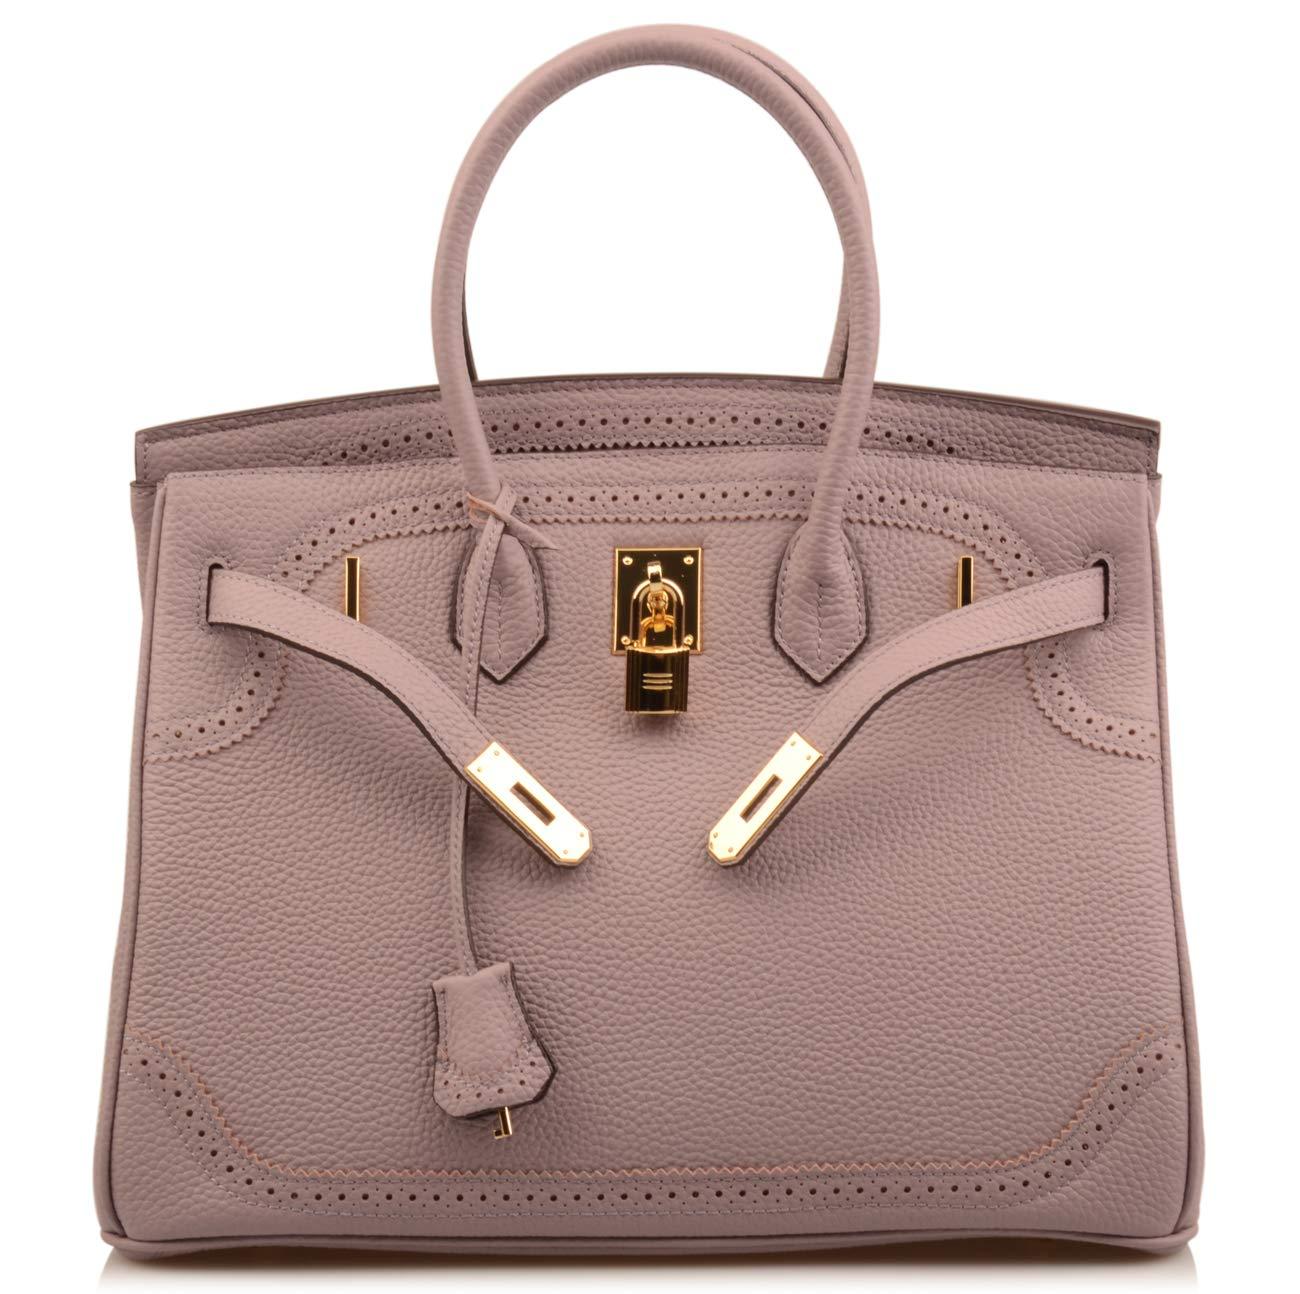 Qidell Women's Padlock Handbags Genuine leather Lace Padlock Purse Gold Hardware (13.8'' (35cm), Lavender)